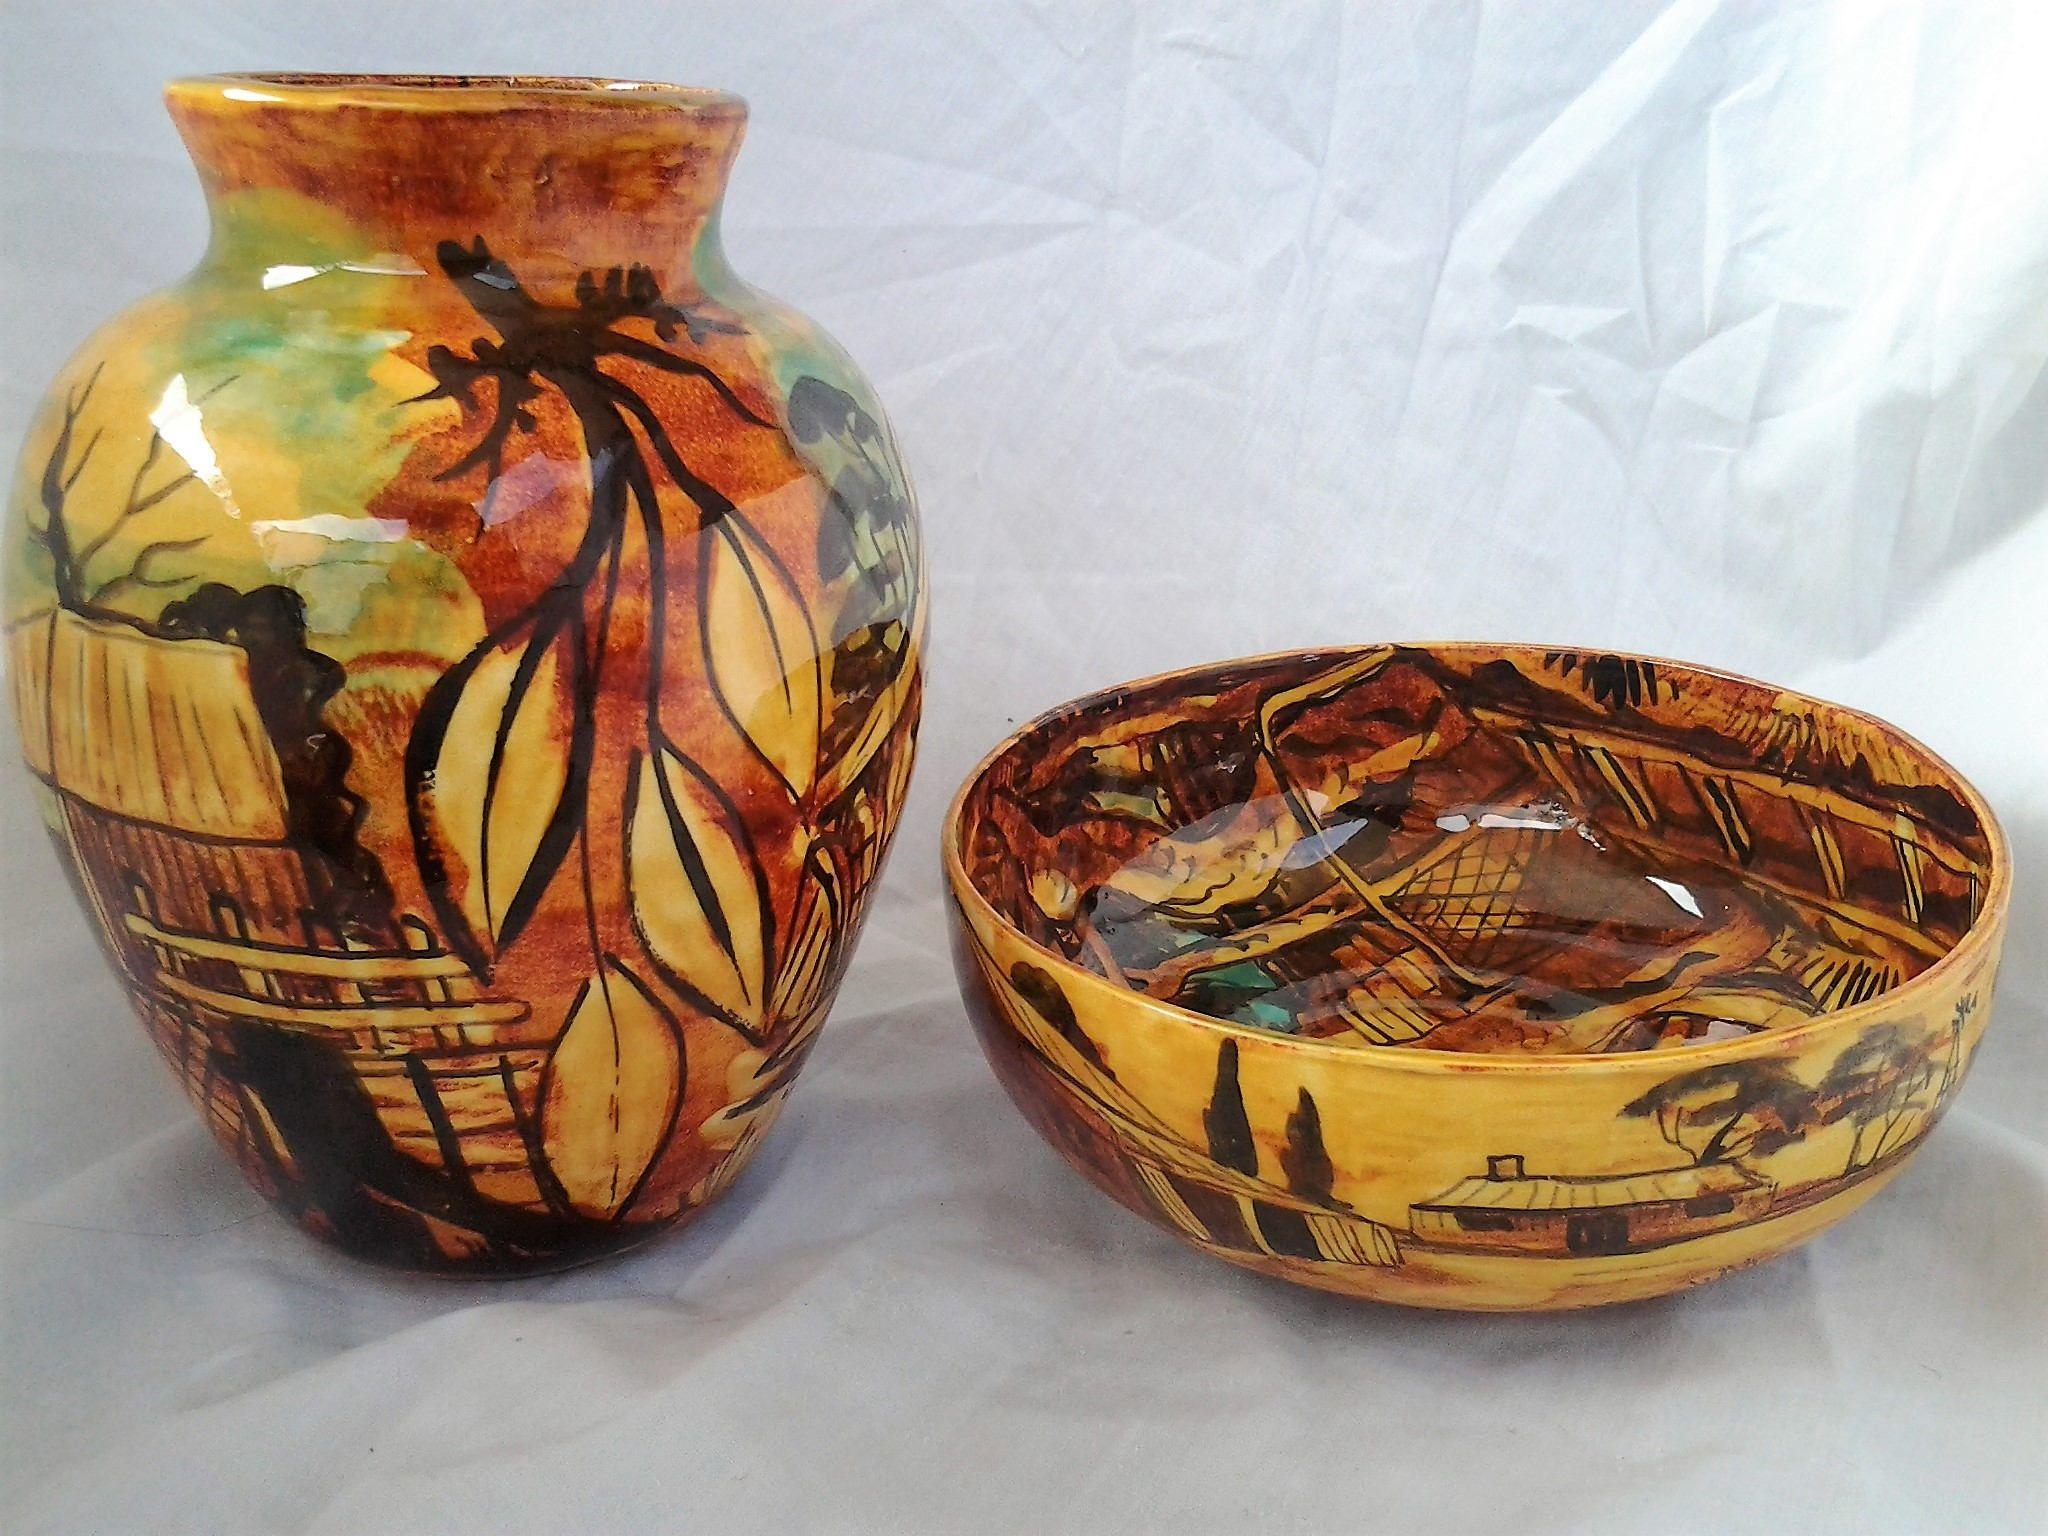 Pin by old vintage treasures on vintage vases for sale pinterest stunning handpainted barossa valley sa bowl and vase vintage reviewsmspy